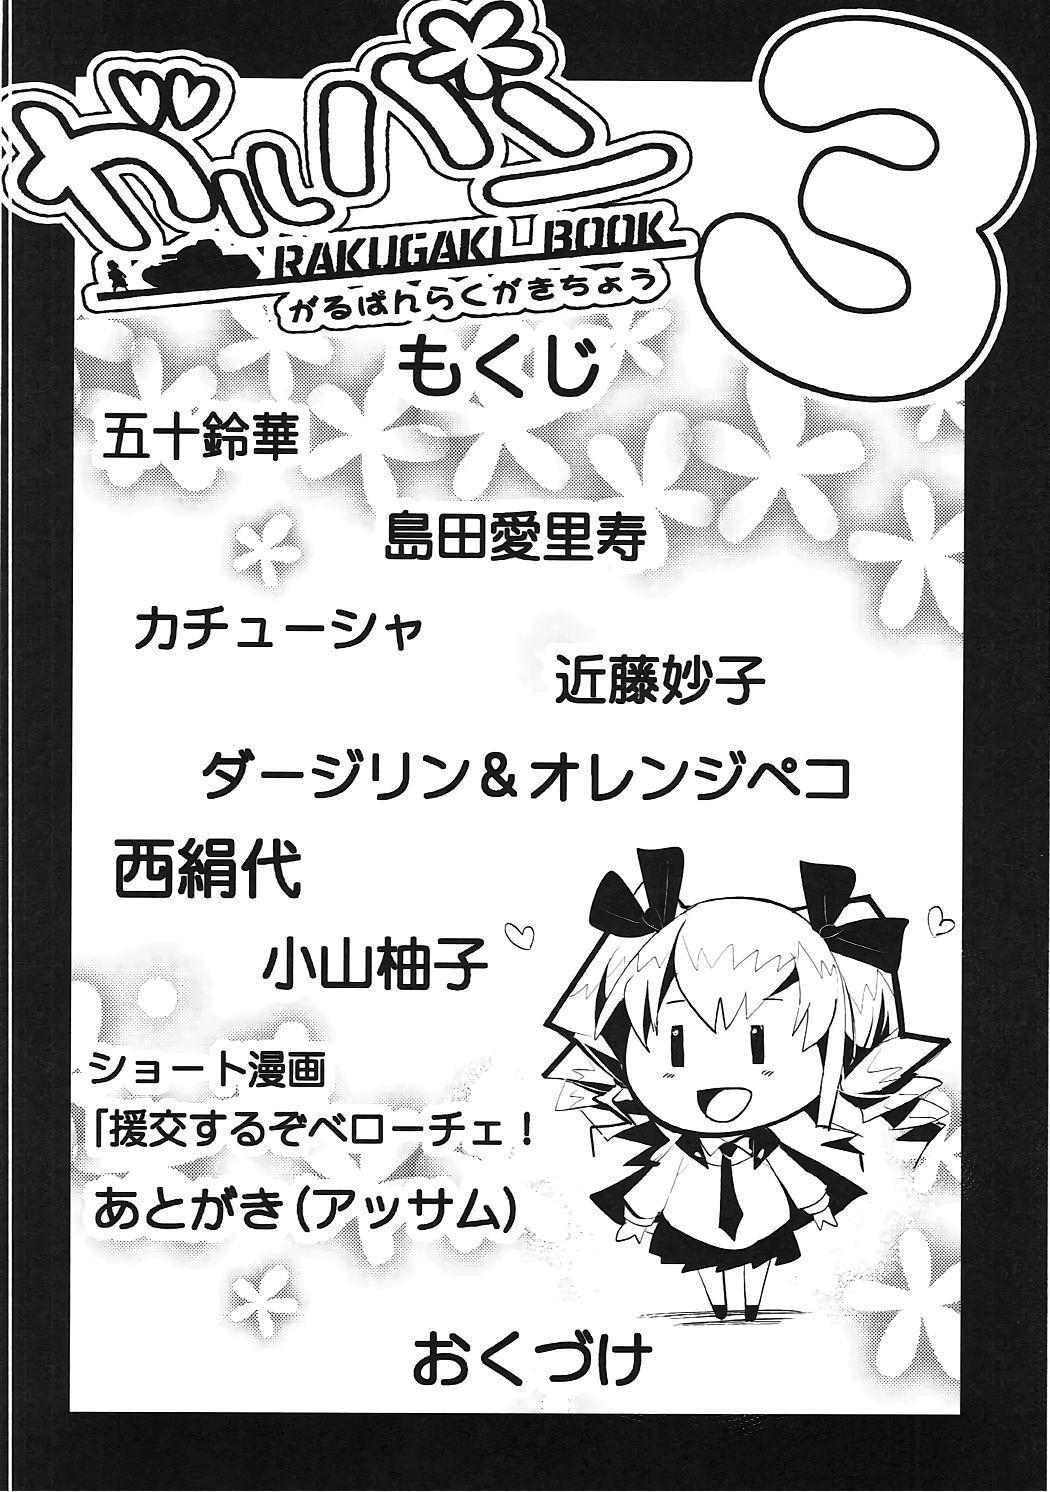 GirlPan Rakugakichou 3 2